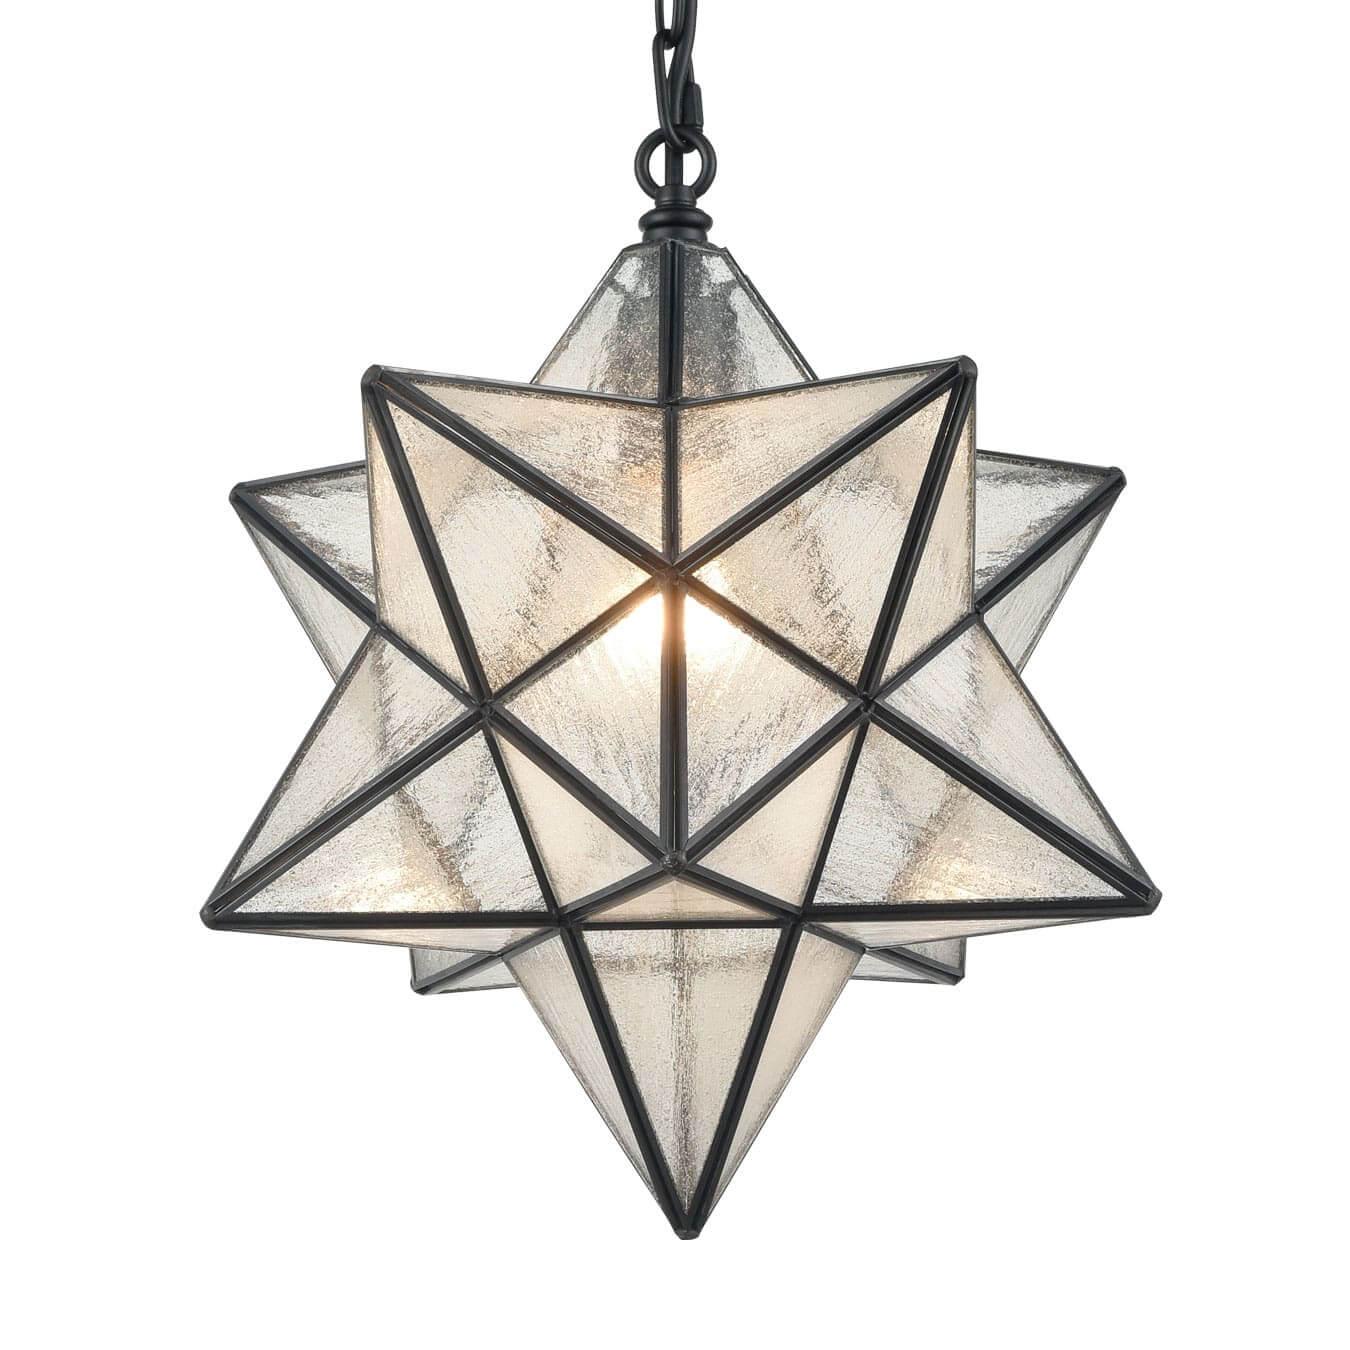 Vintage Moravian Star Seeded Glass Pendant Lights, 14-inch Diameter